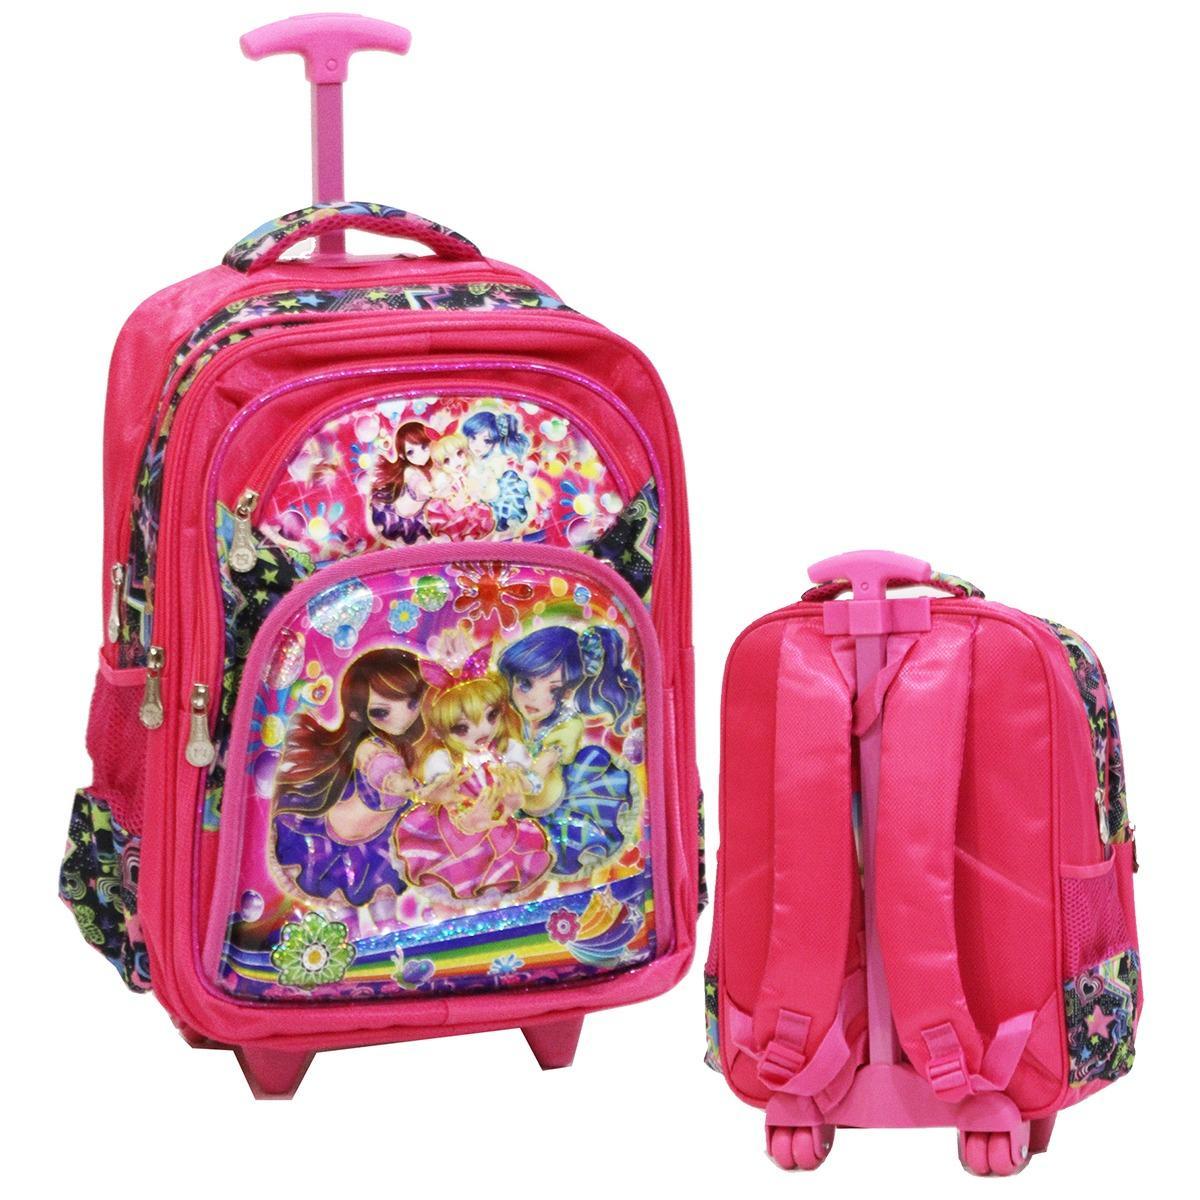 Onlan Tas Trolley Anak Sekolah SD Karakter Anak Perempuan 5D Timbul Hologram Kantung Besar Import -